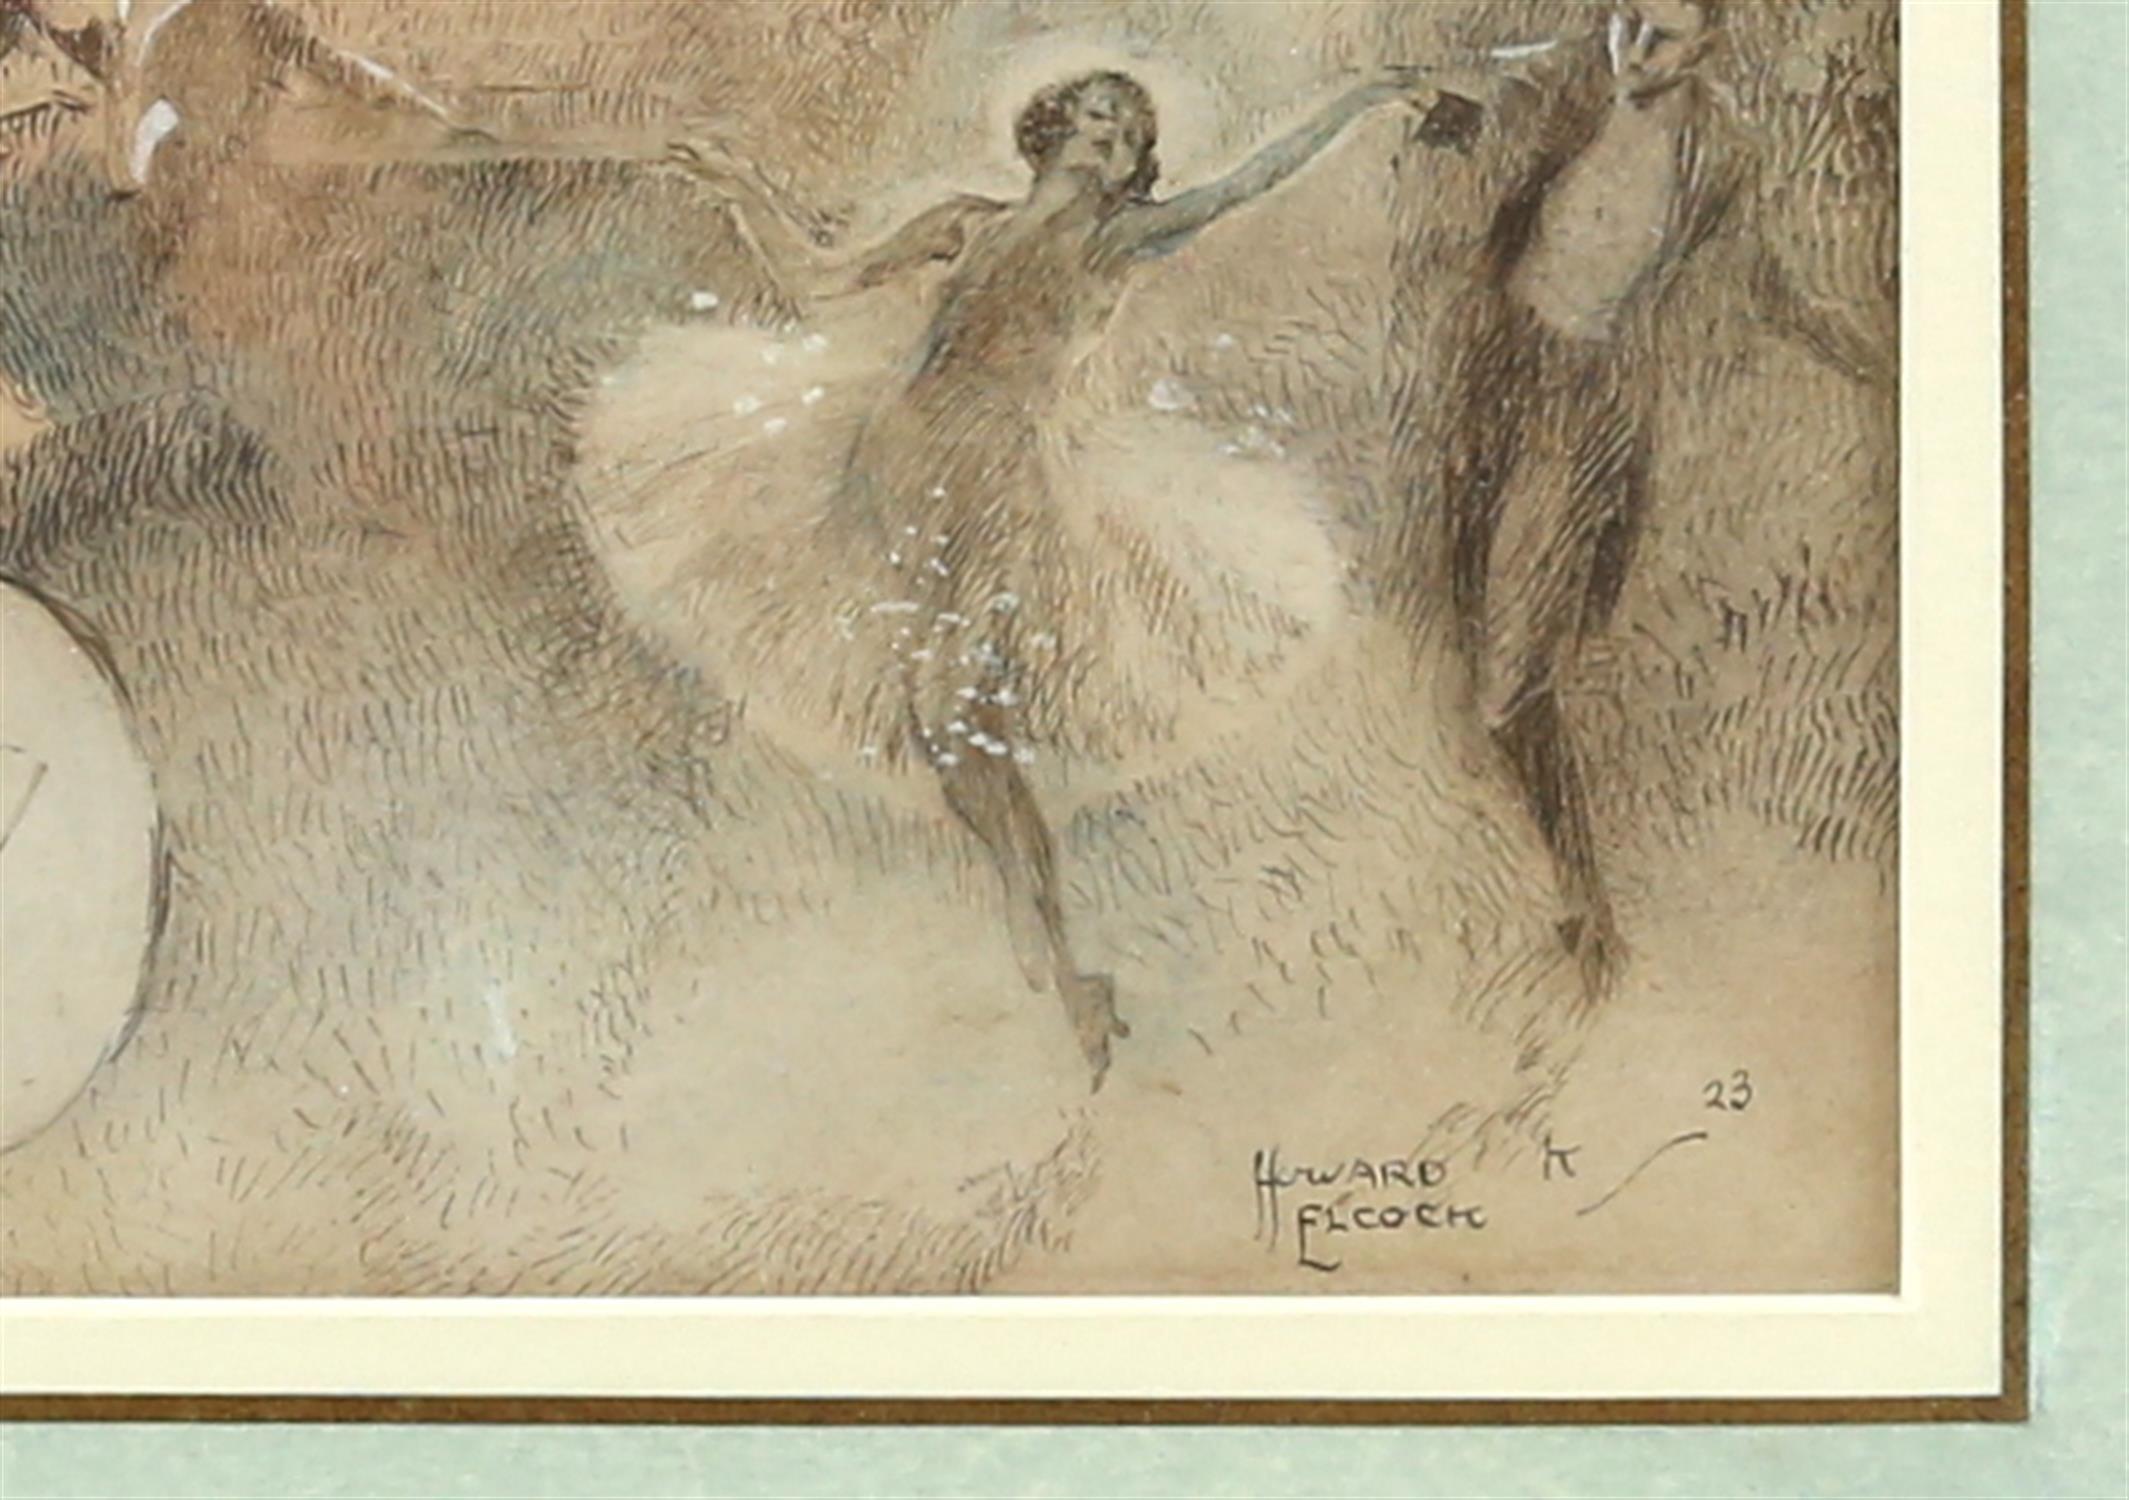 § Howard K. Elcock (British, 1886-1952). Fantasy figures partying. Watercolour 1923. - Image 3 of 4